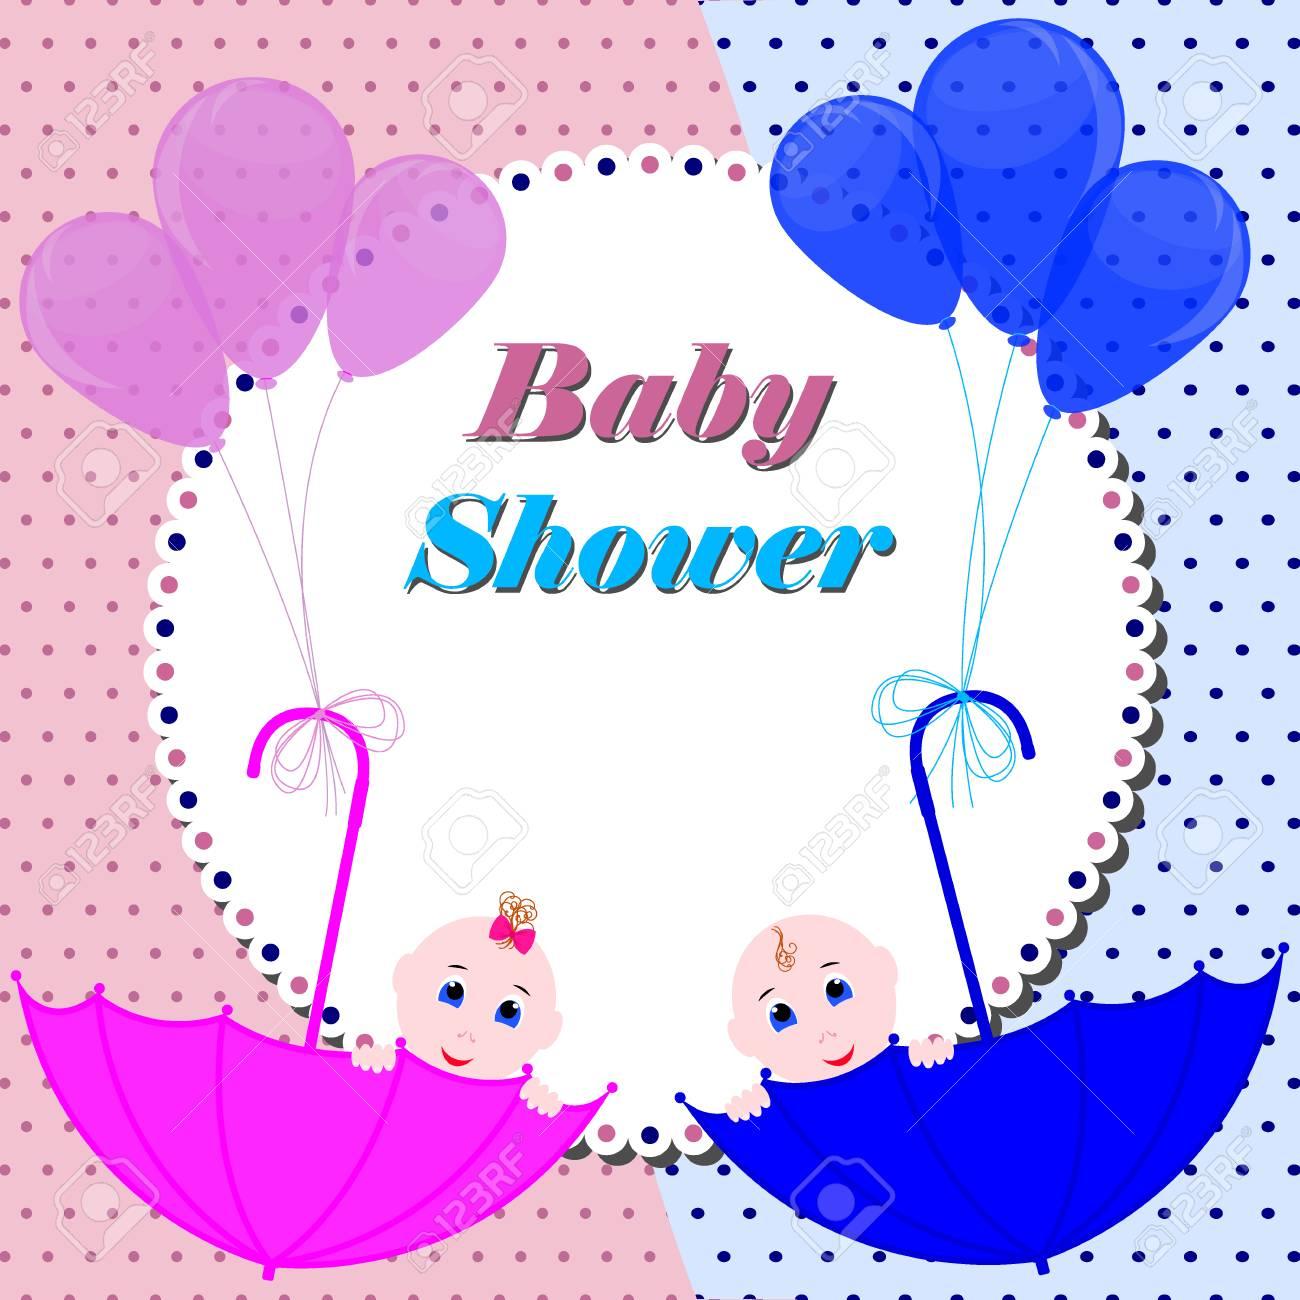 Baby Shower Invitation Card Cute Boy And Girl Sitting In Umbrella